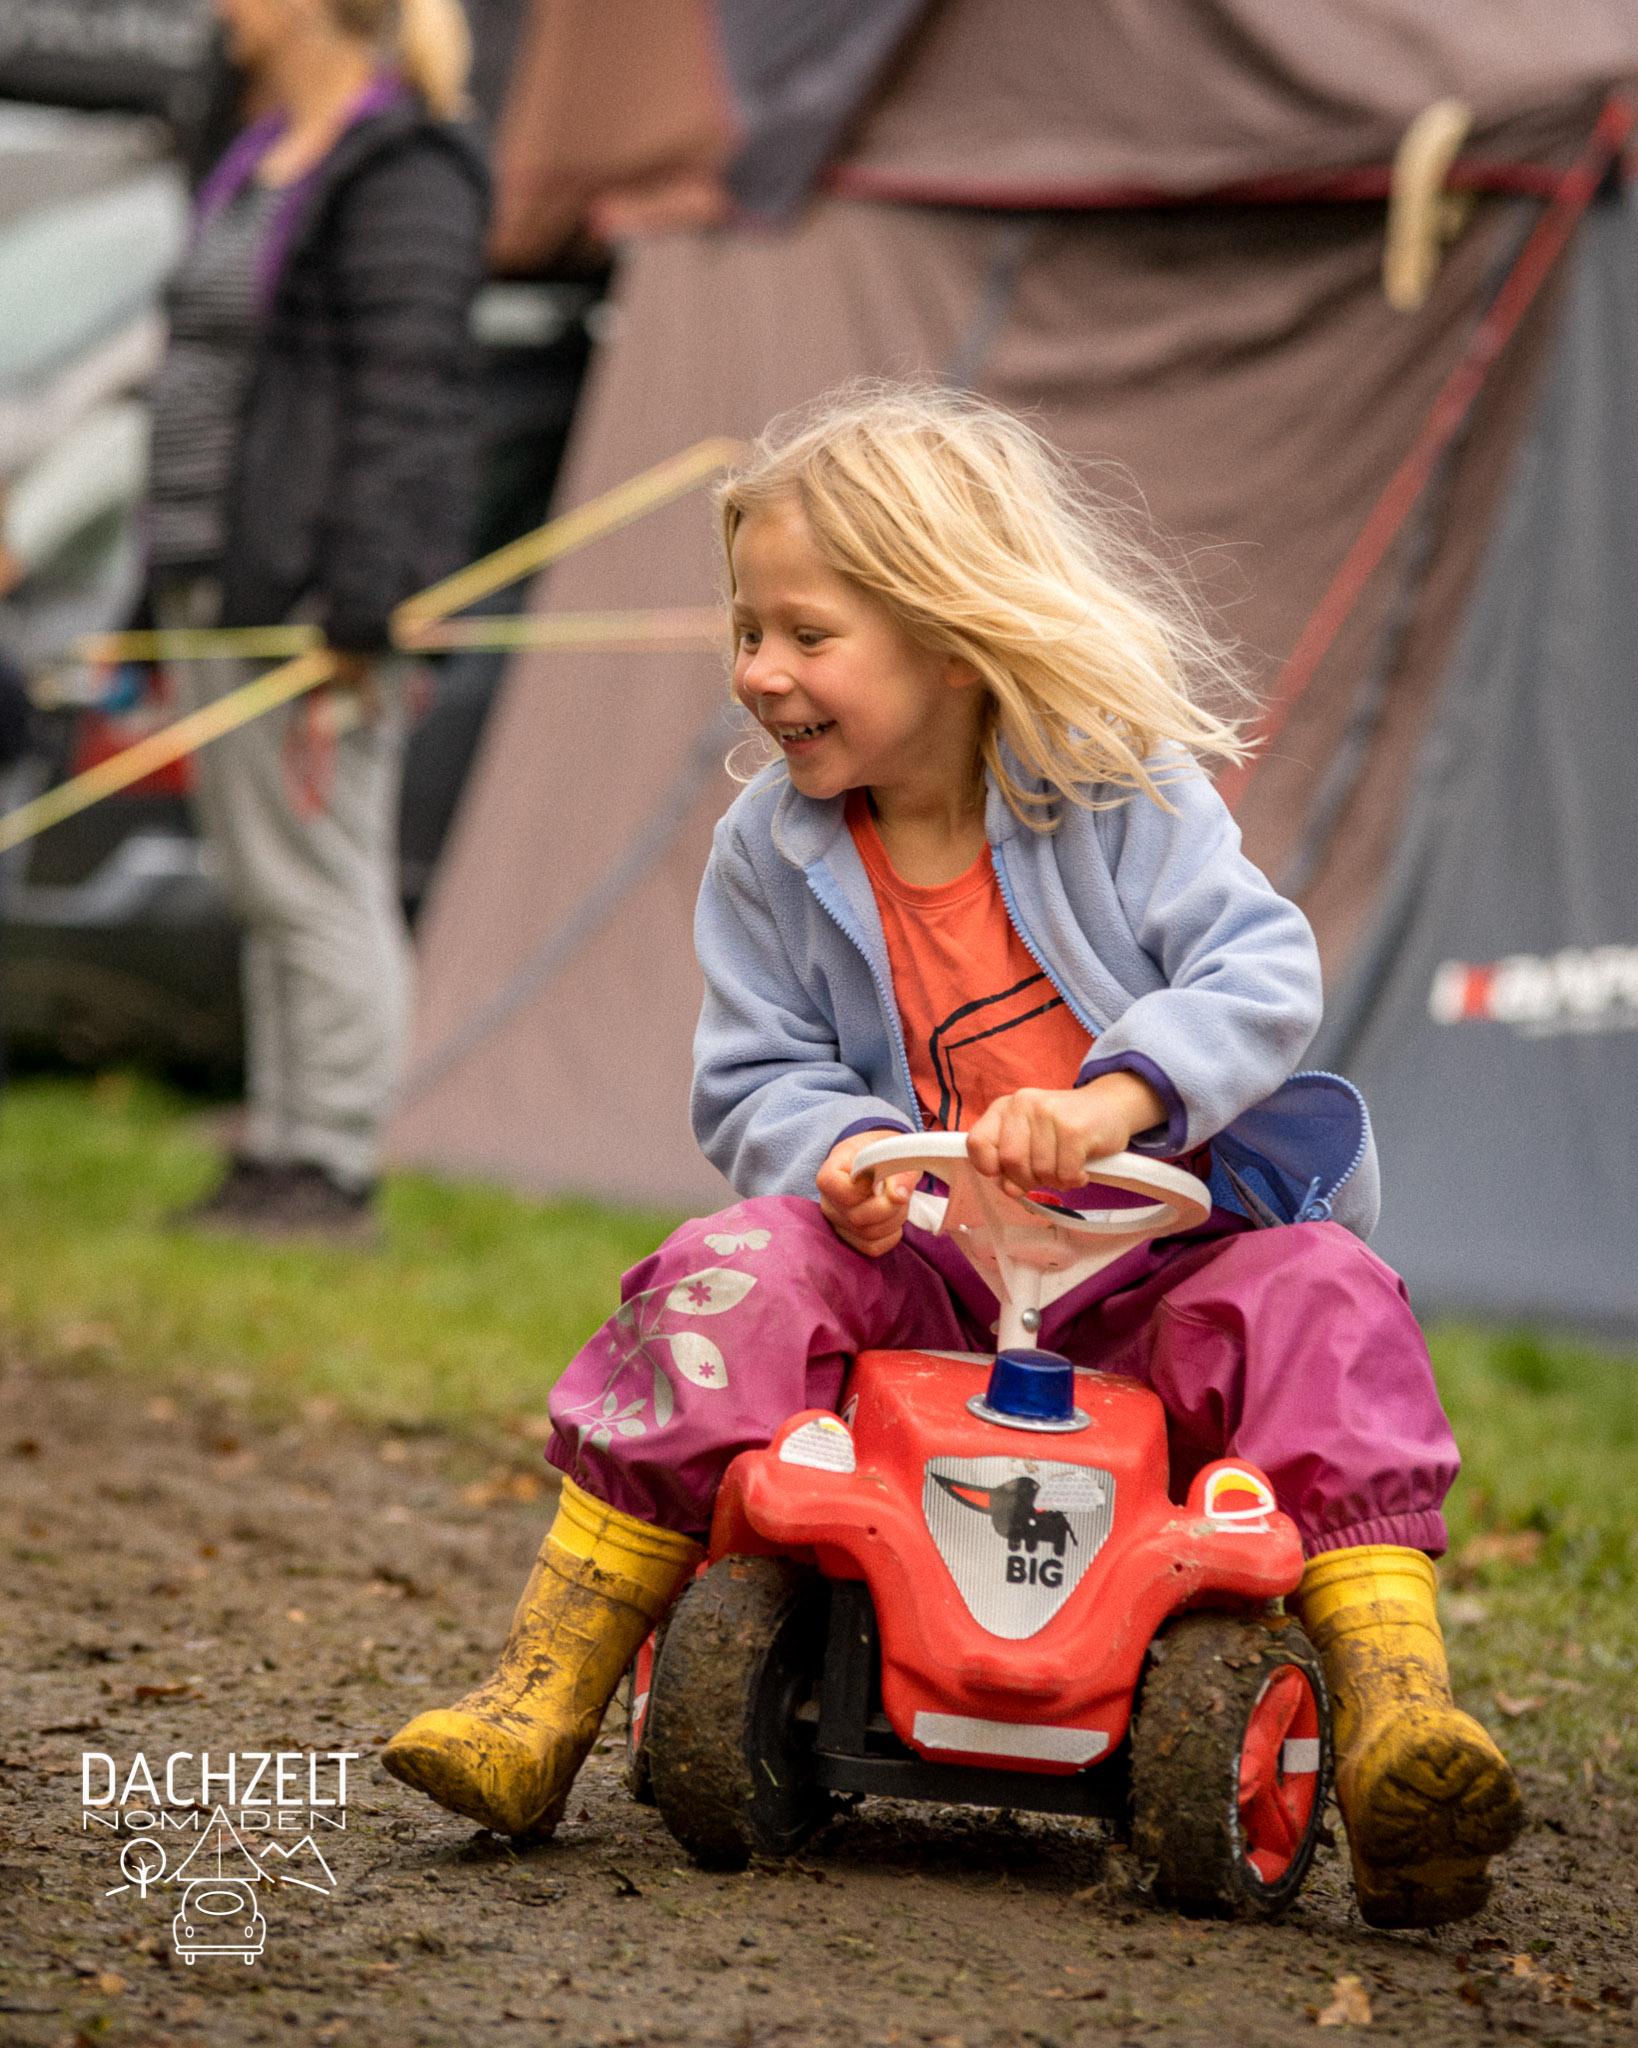 20191019-Dachzelt-Camp-Speciaal-Diana-Schandwinkel-DSC08720